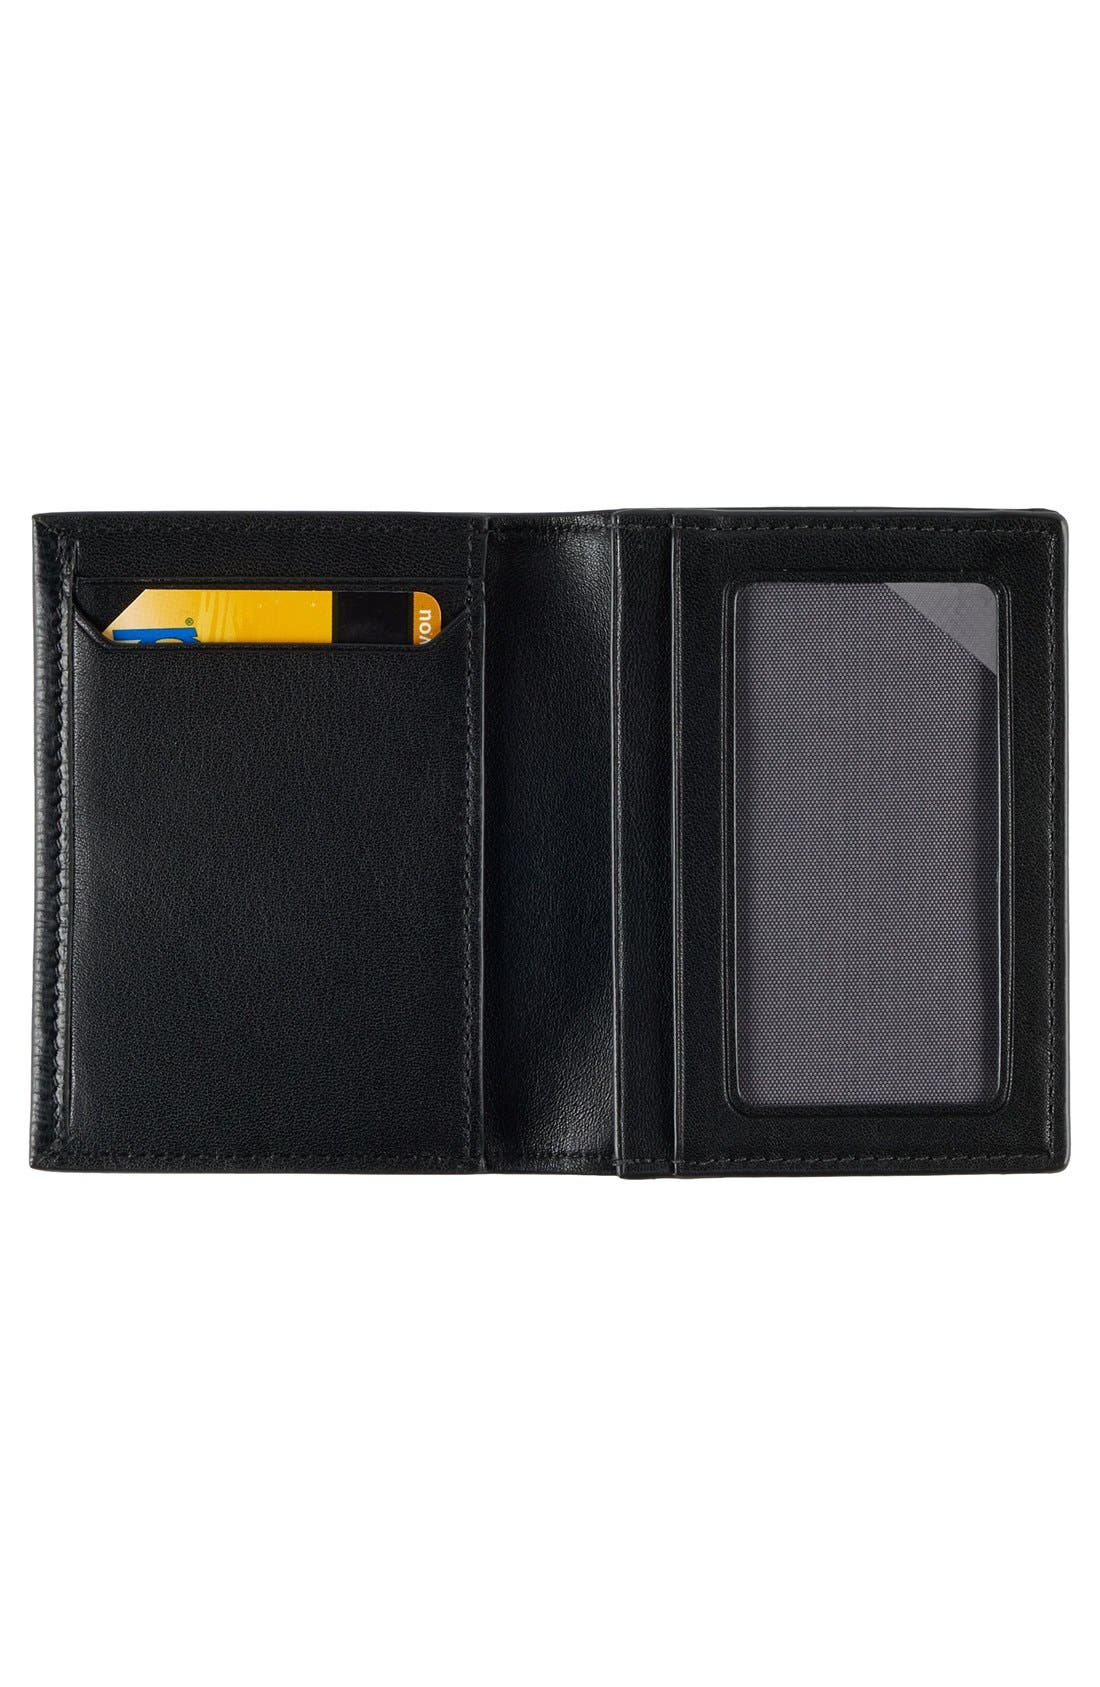 Monaco Leather Card Case,                             Alternate thumbnail 2, color,                             001